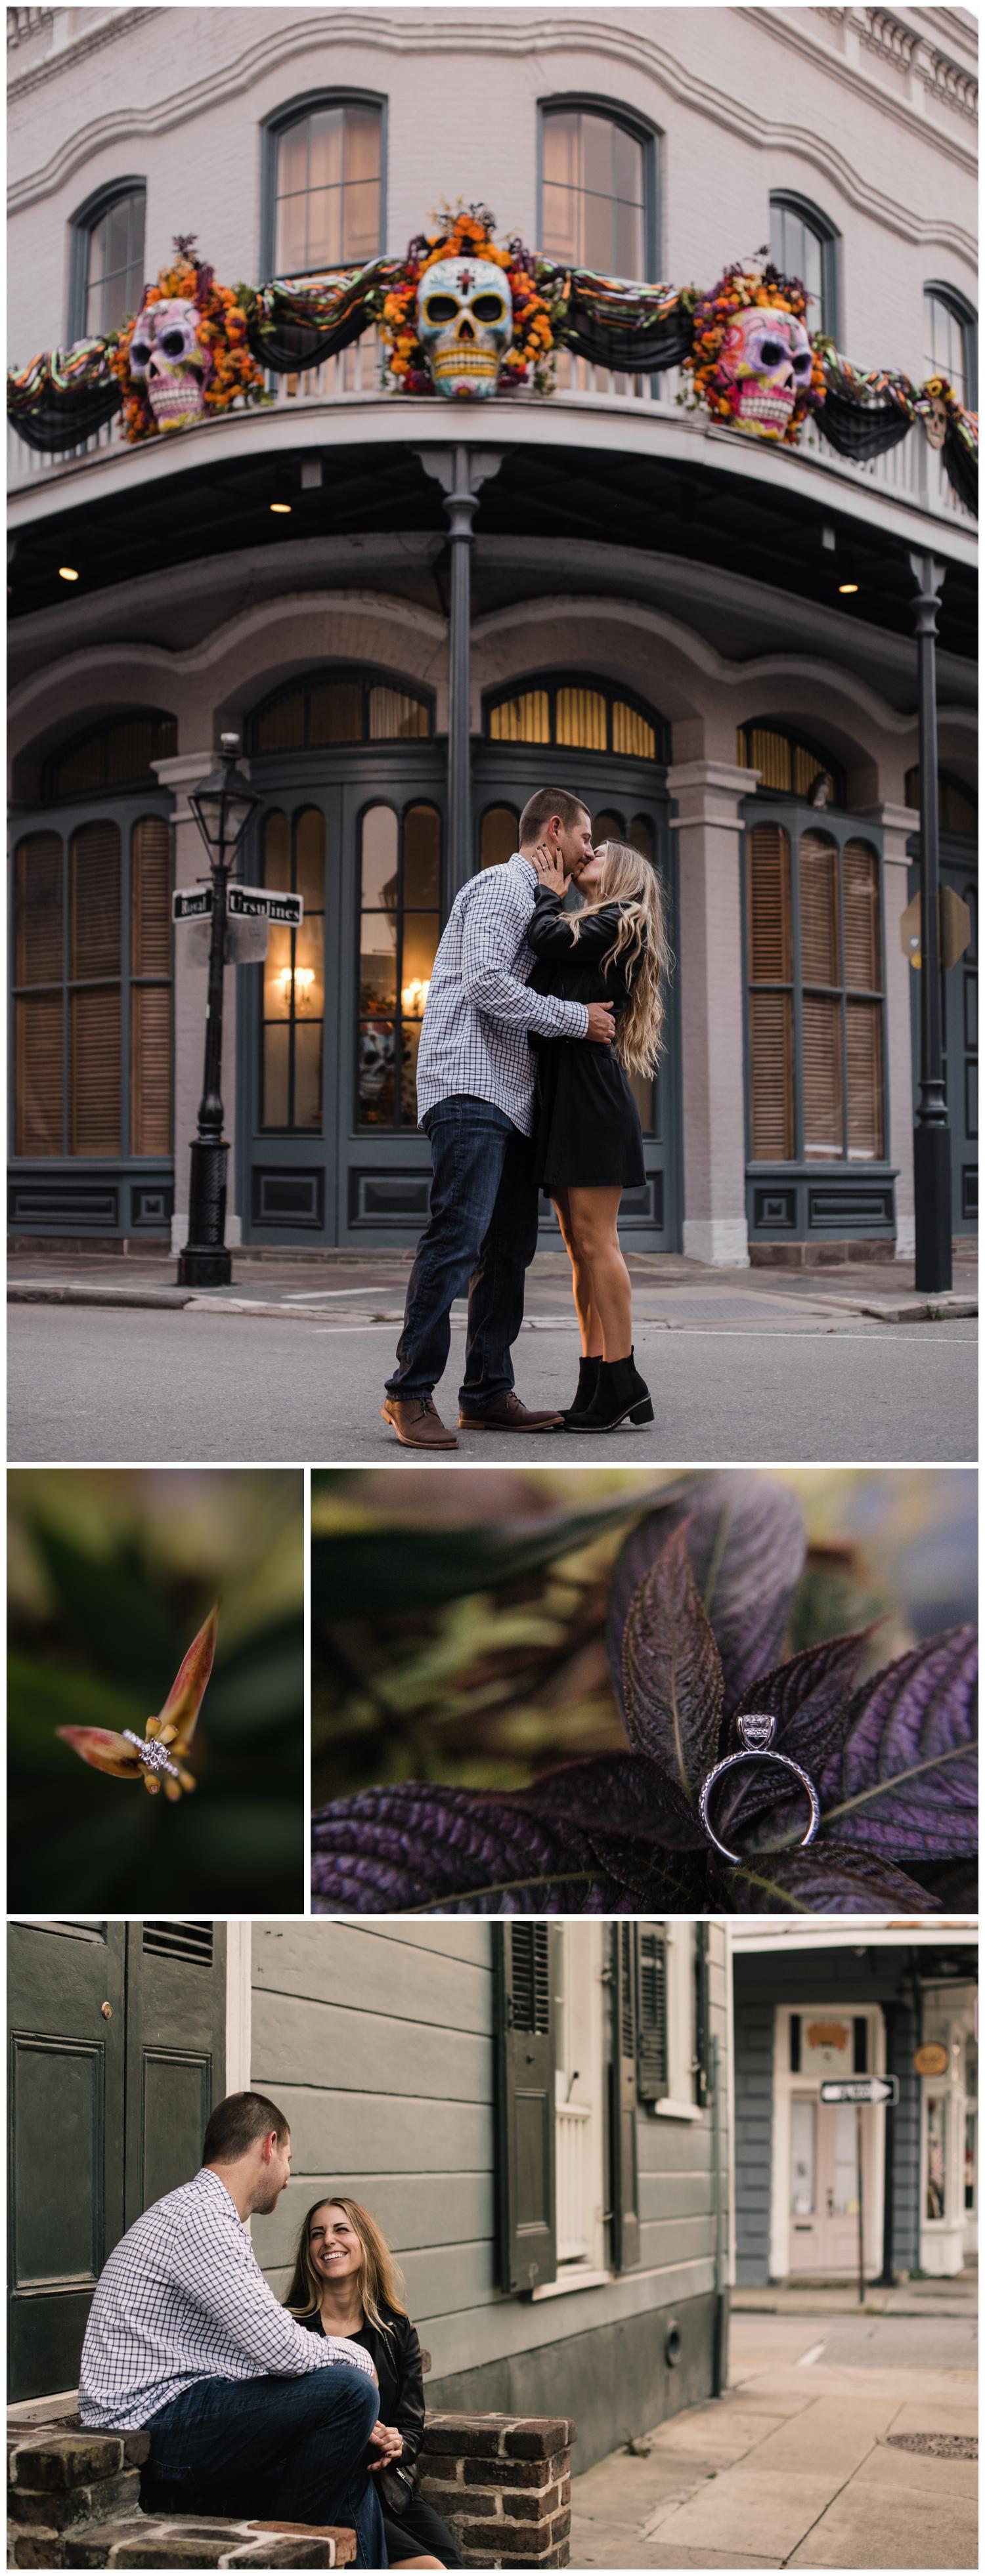 New-Orleans-Engagement-photos- French-Quarter-Proposal-New-Orleans-Photographer- kallistia-photography_0012.jpg